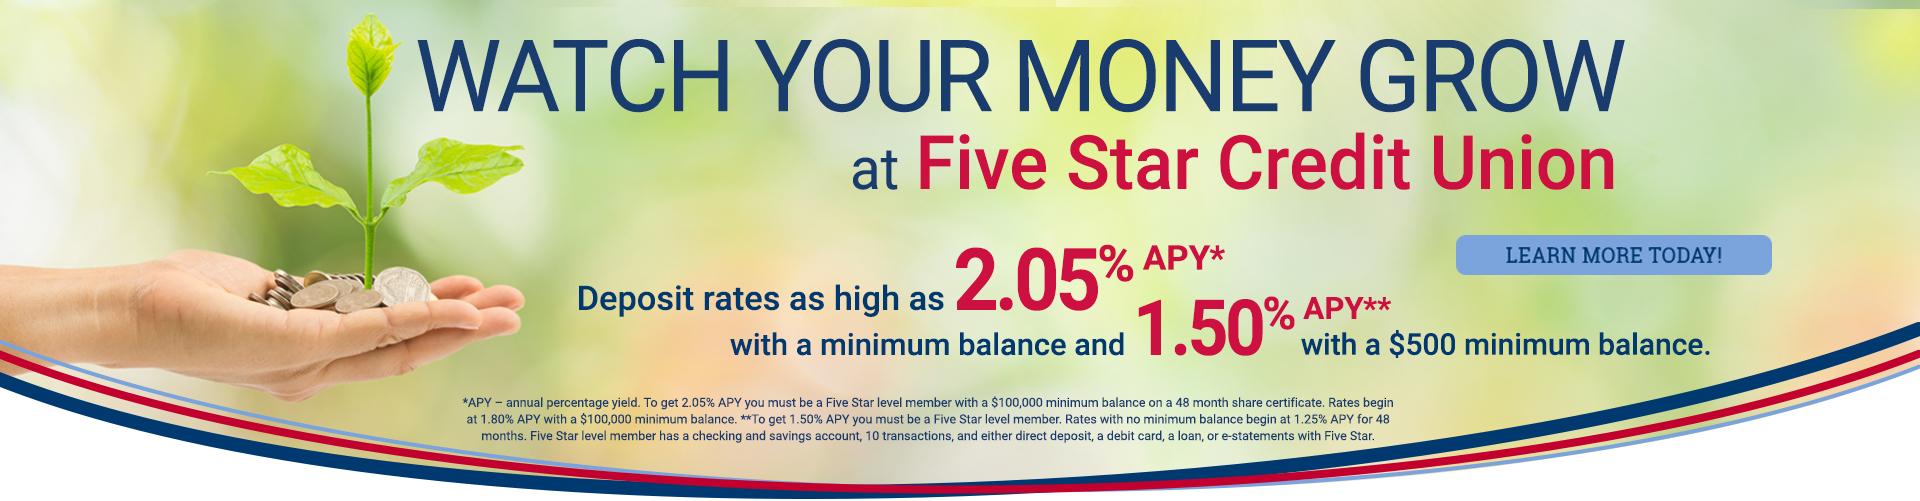 Deposit Rate Campaign